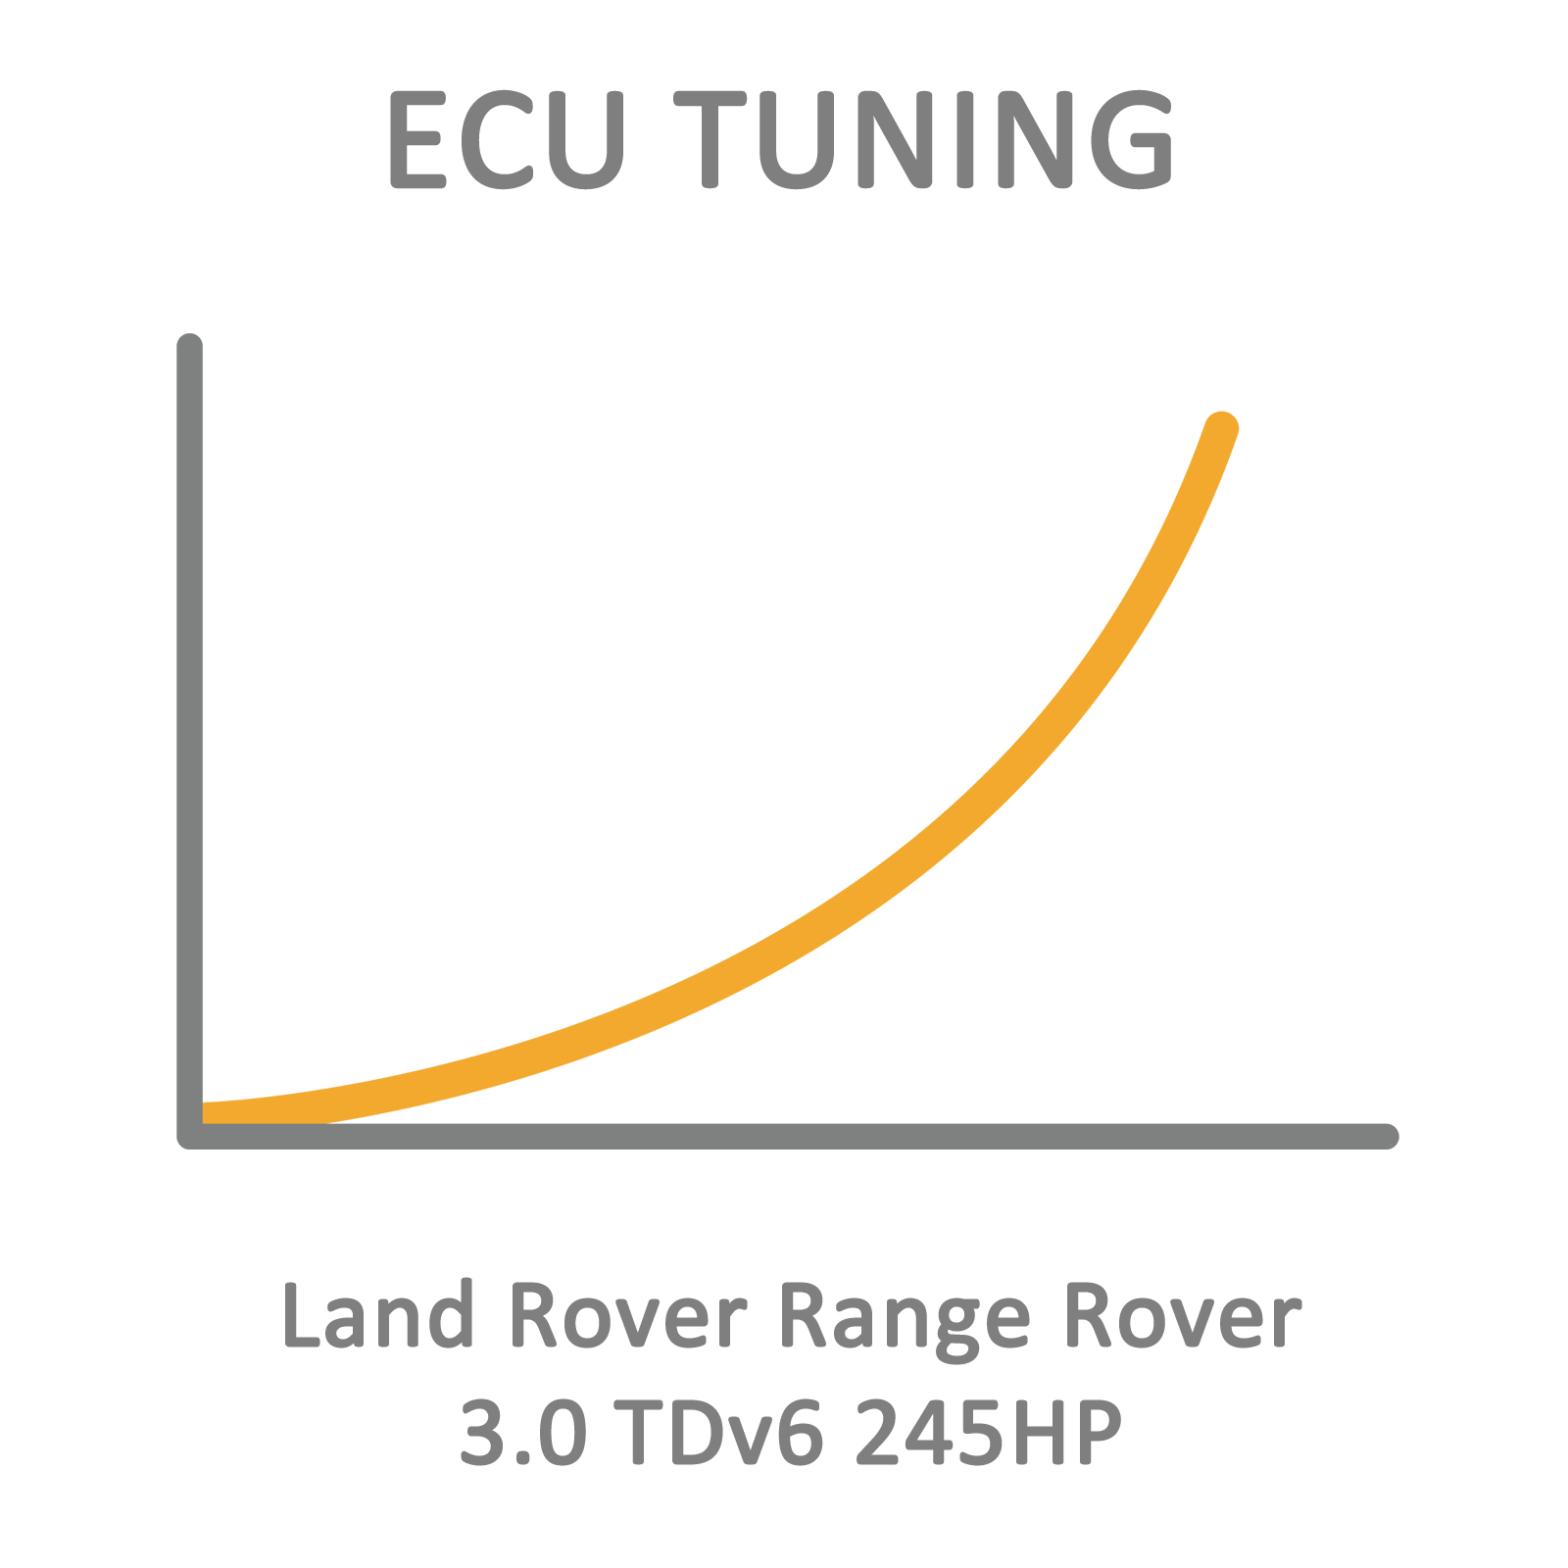 Land Rover Range Rover 3.0 TDv6 245HP ECU Tuning Remapping